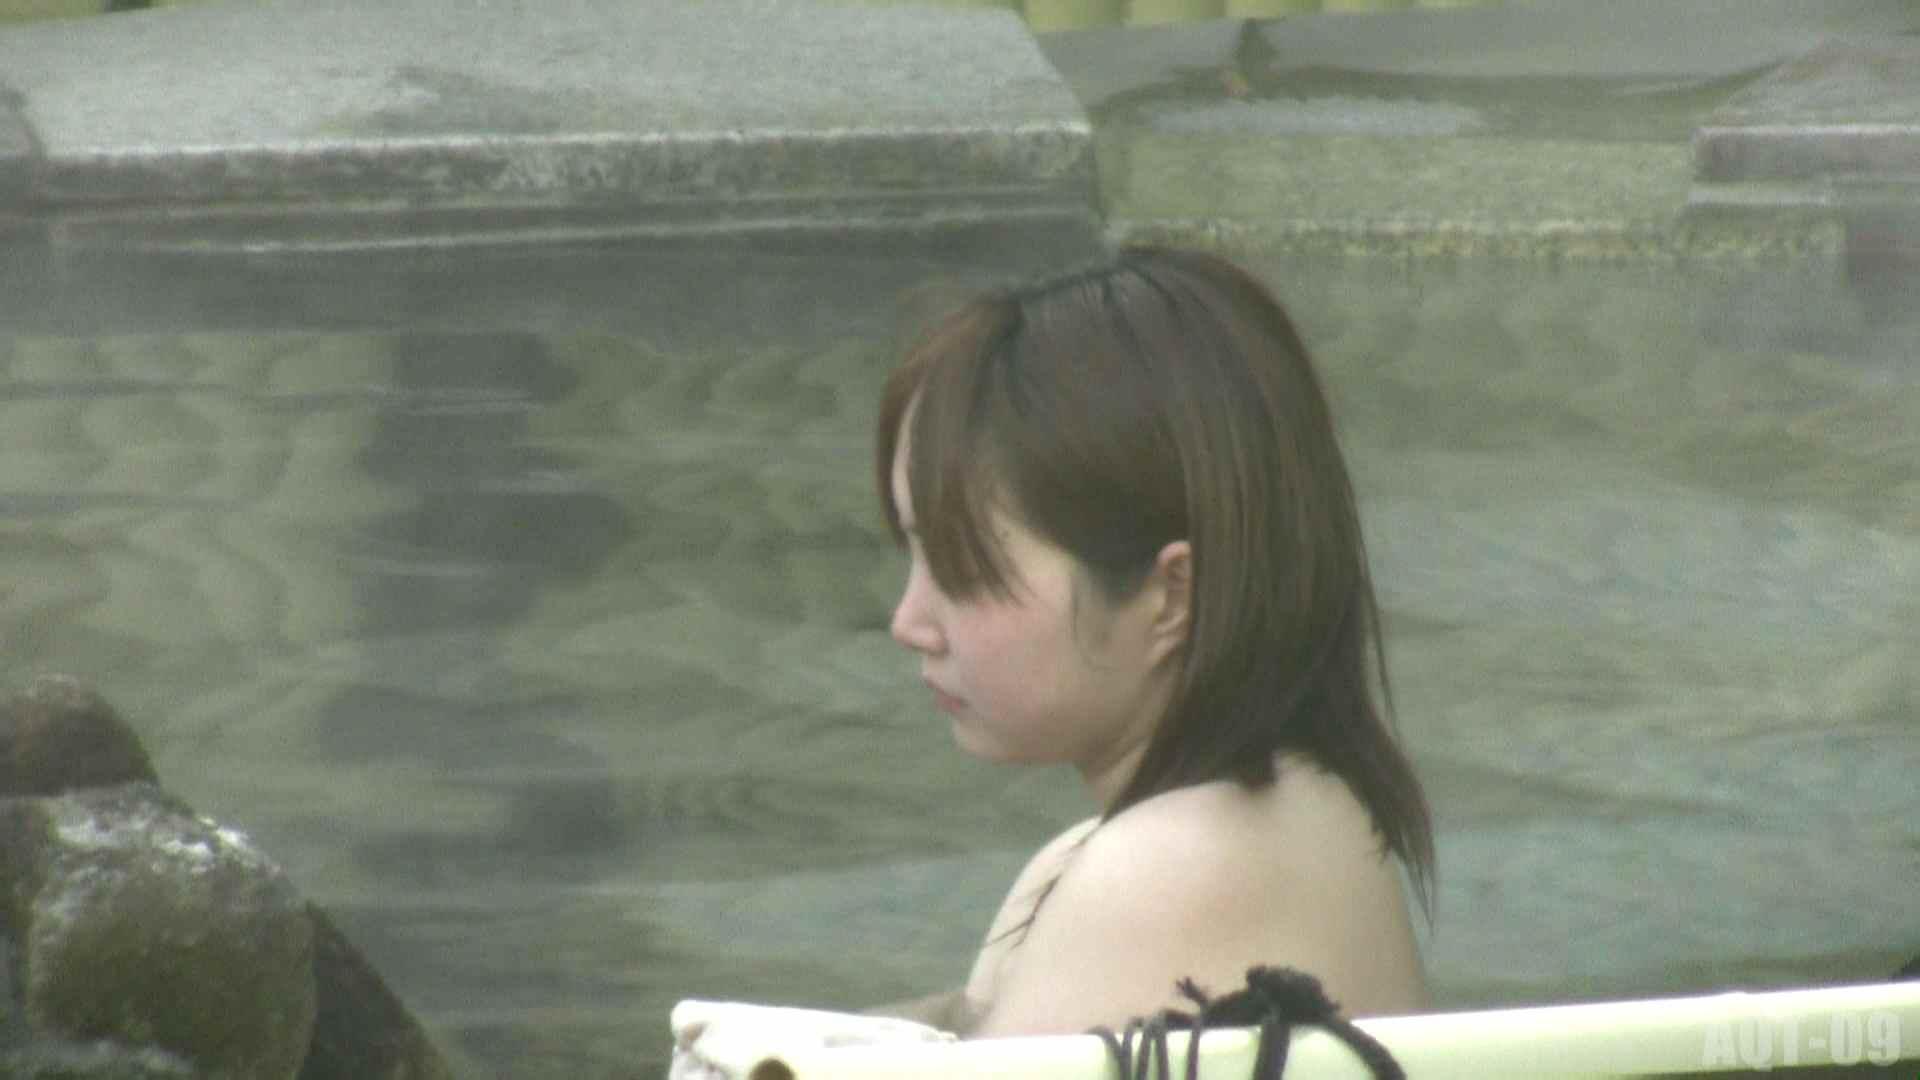 Aquaな露天風呂Vol.781 盗撮大放出 戯れ無修正画像 48連発 18